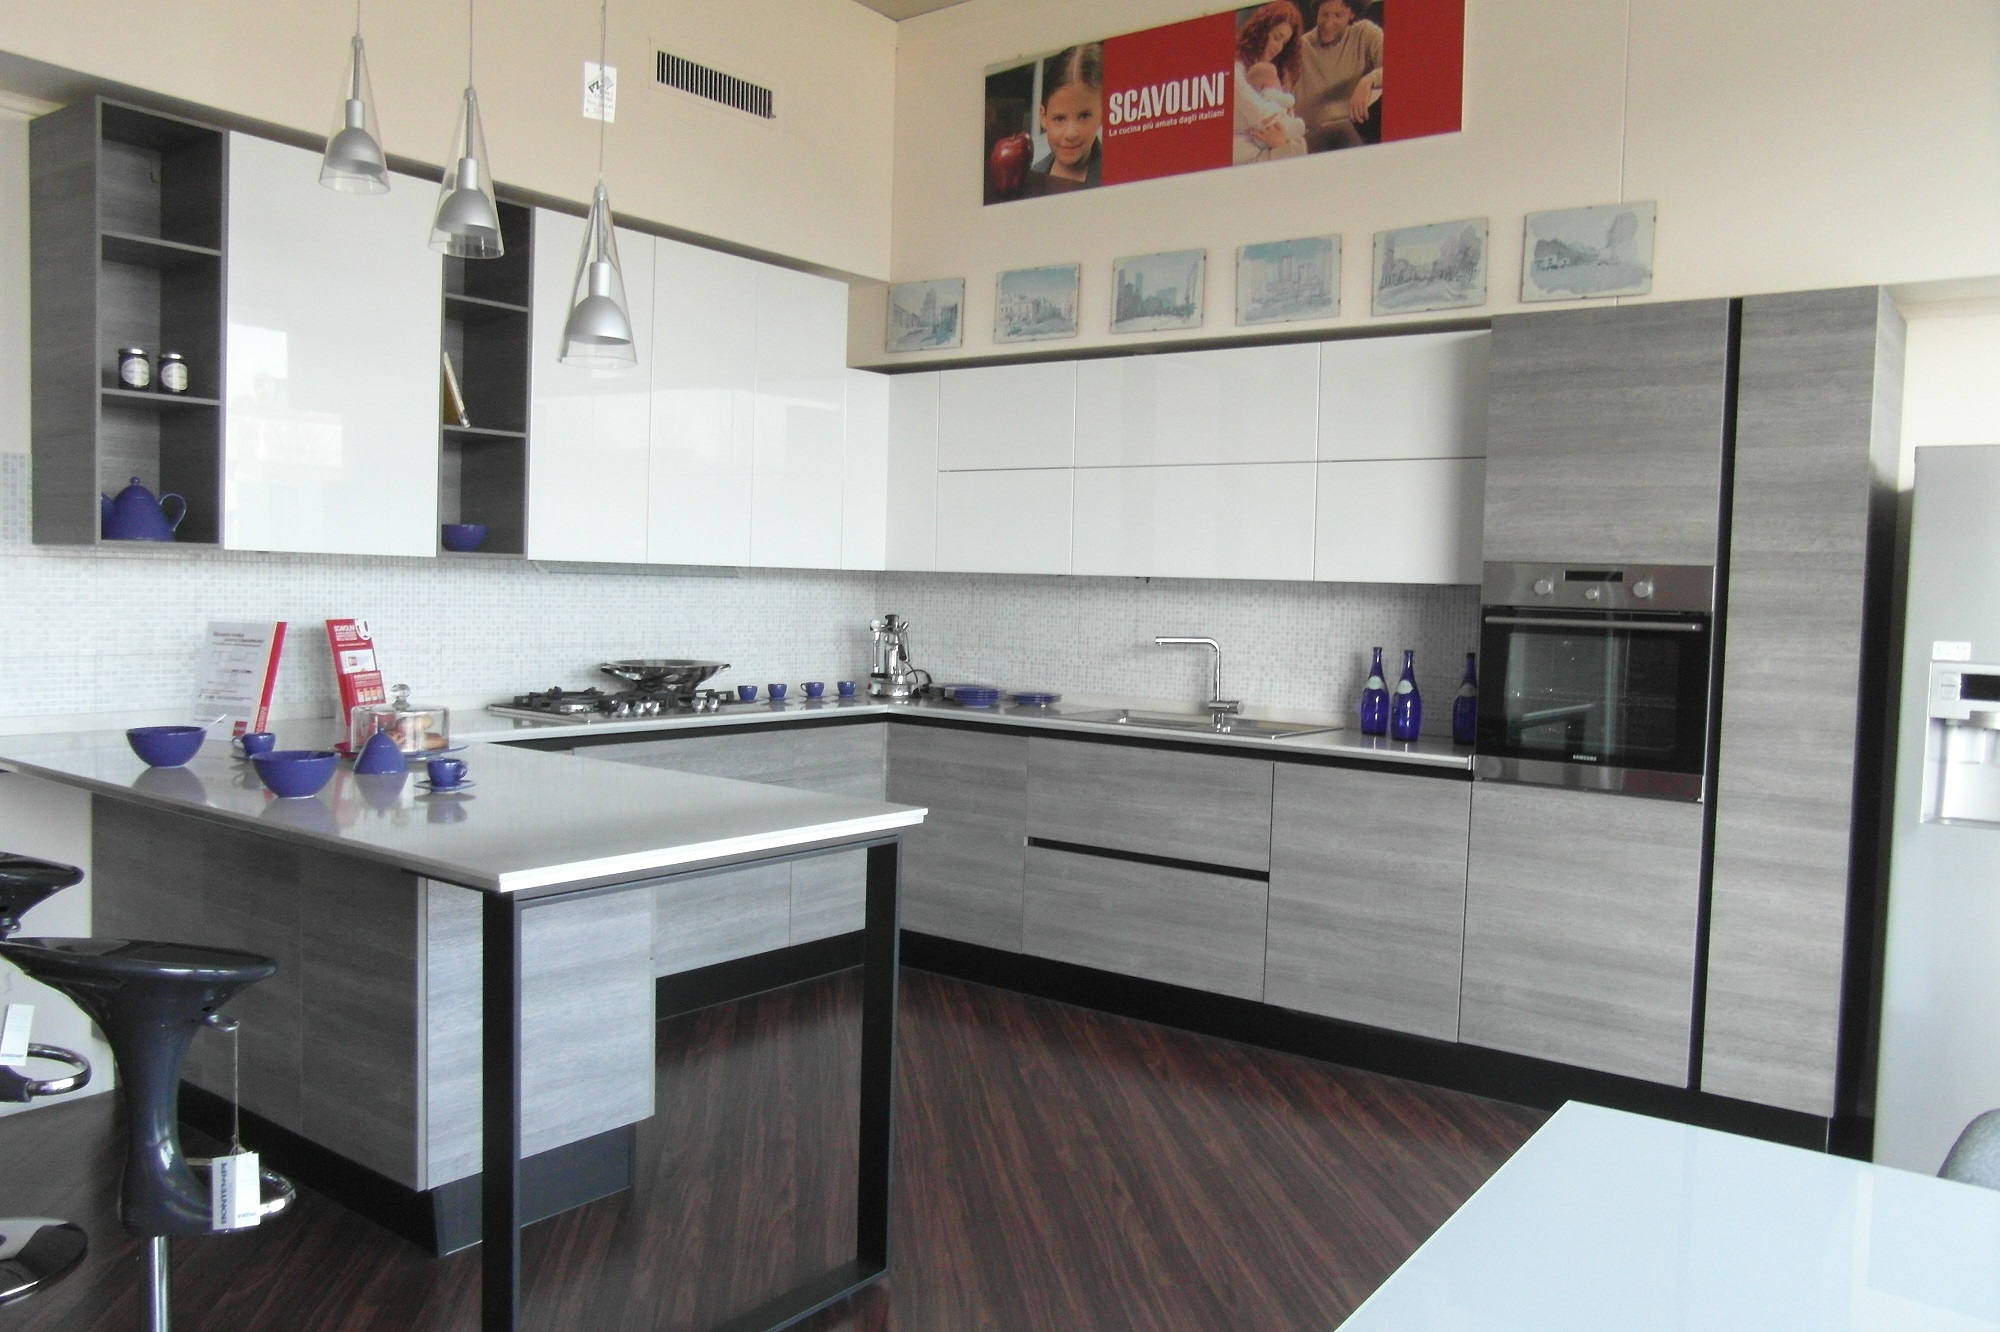 Cucina Moderna Scavolini - Idee Per La Casa - Douglasfalls.com